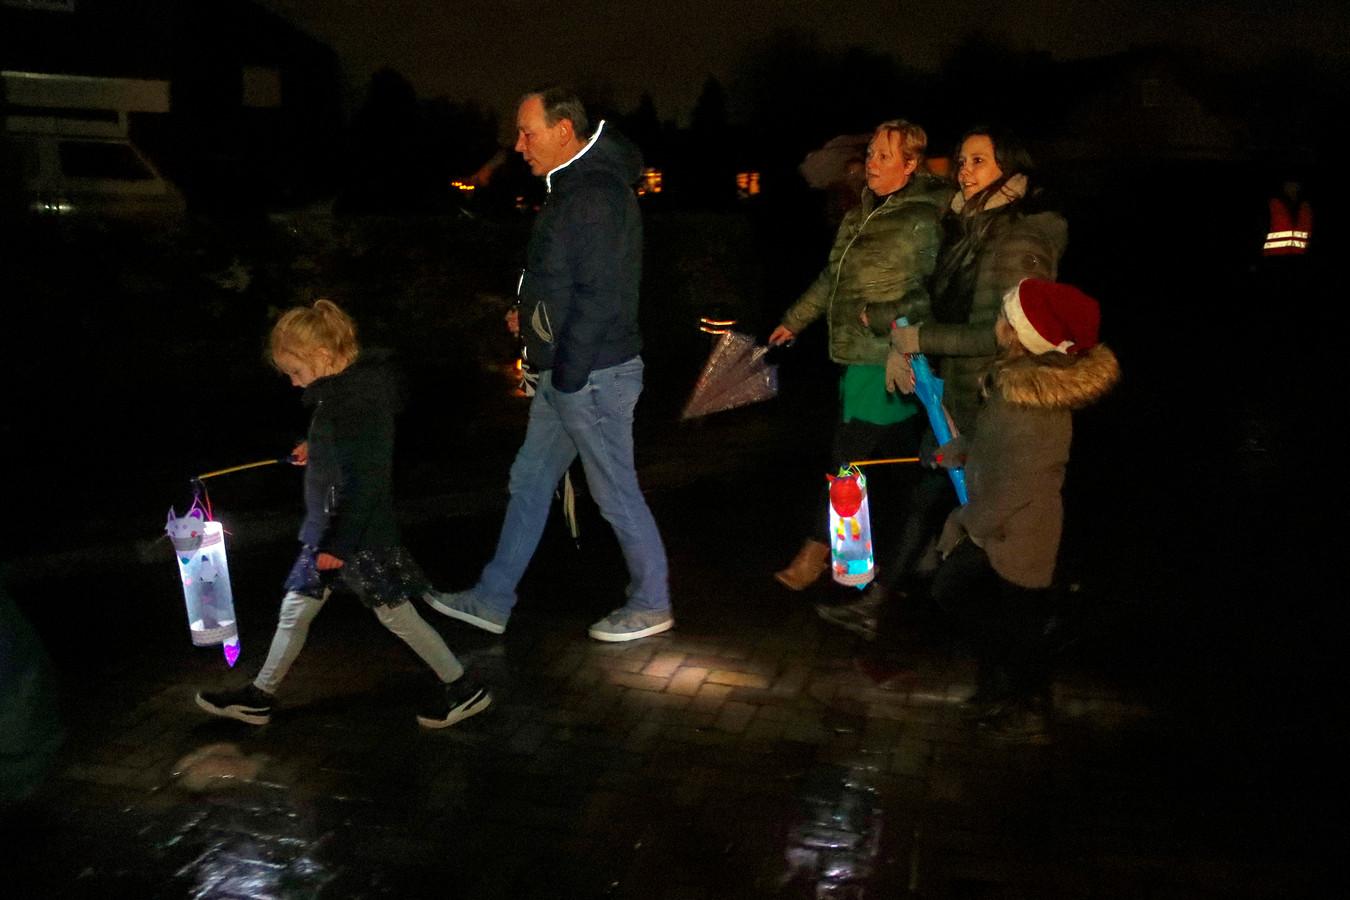 De lichtjesoptocht trok vrijdagavond weer door Someren-Eind.